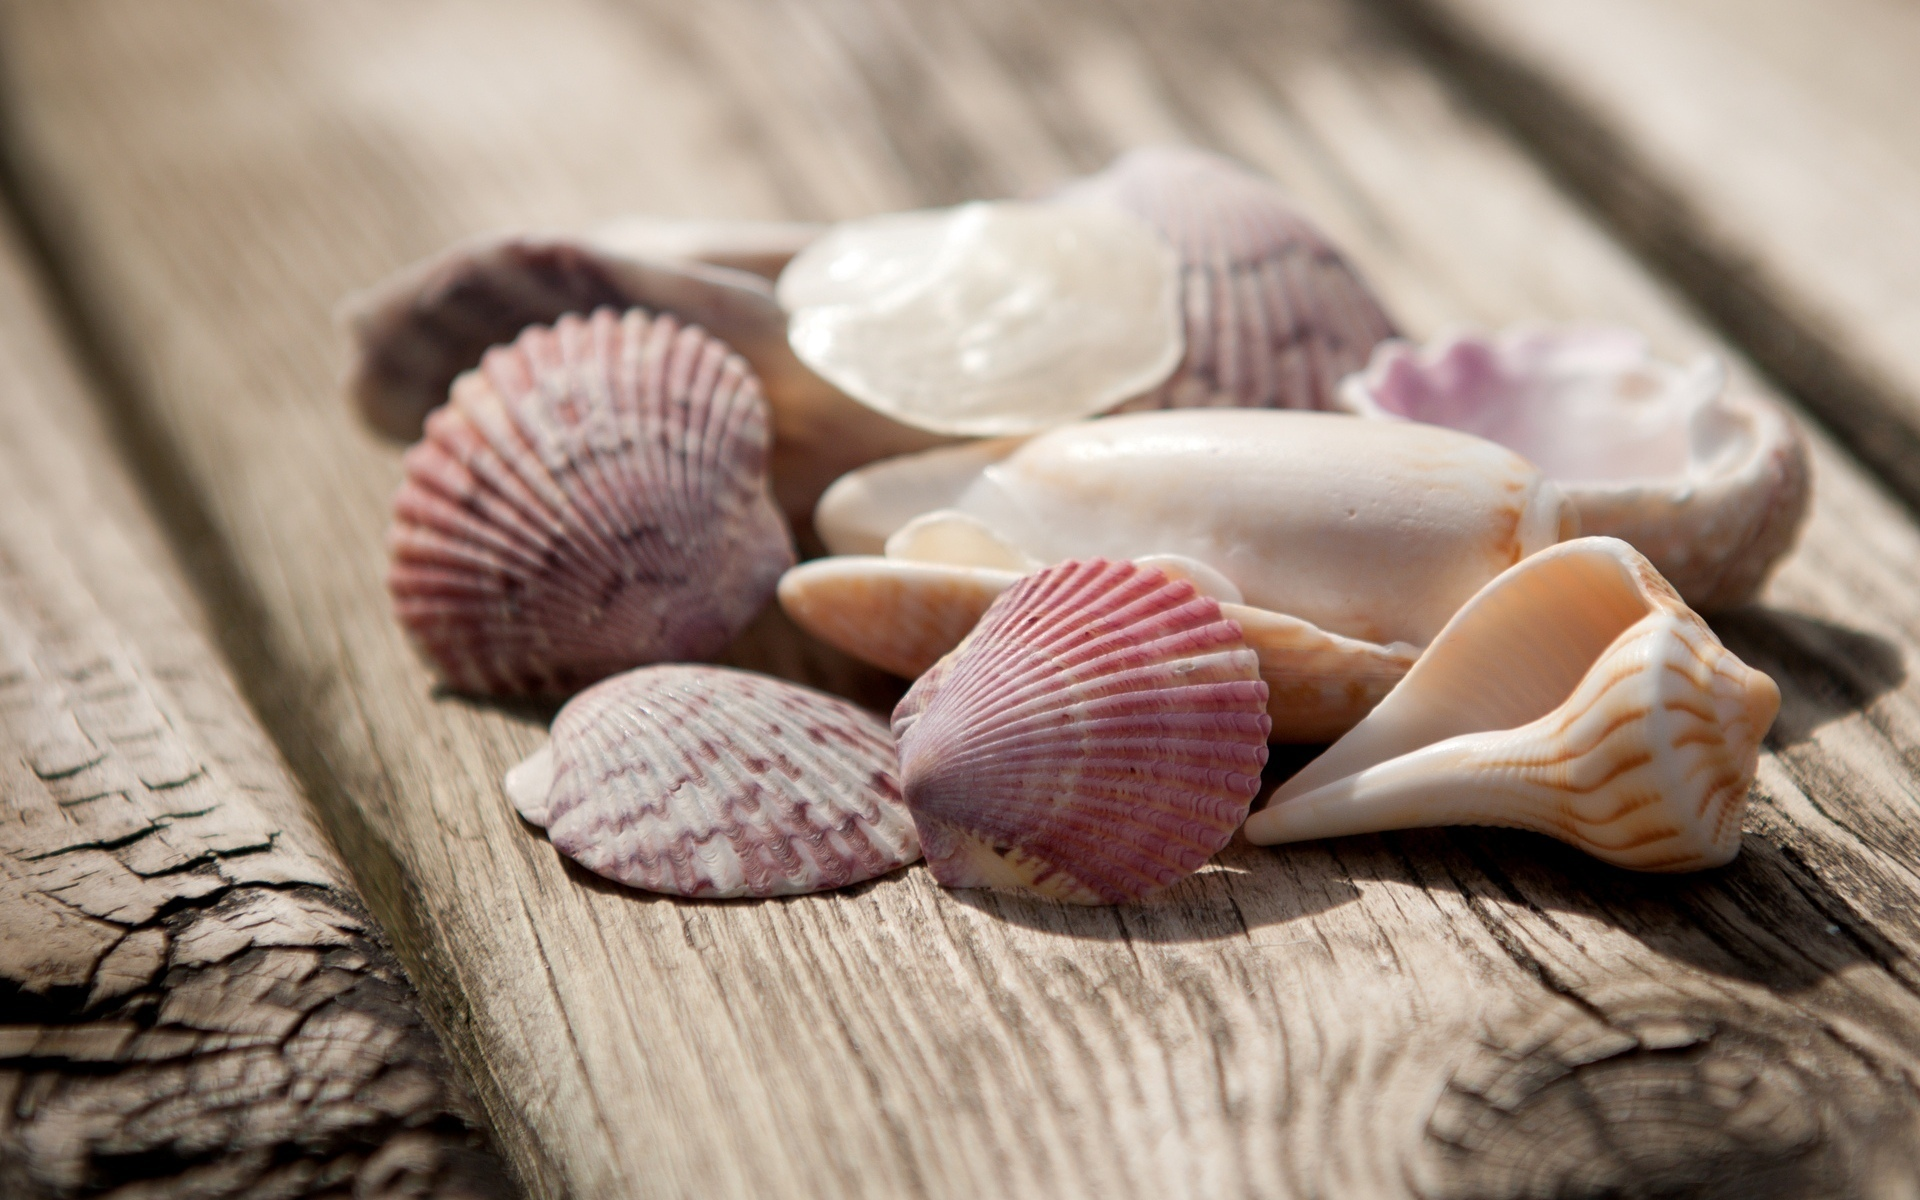 ракушка shell  № 248895 загрузить